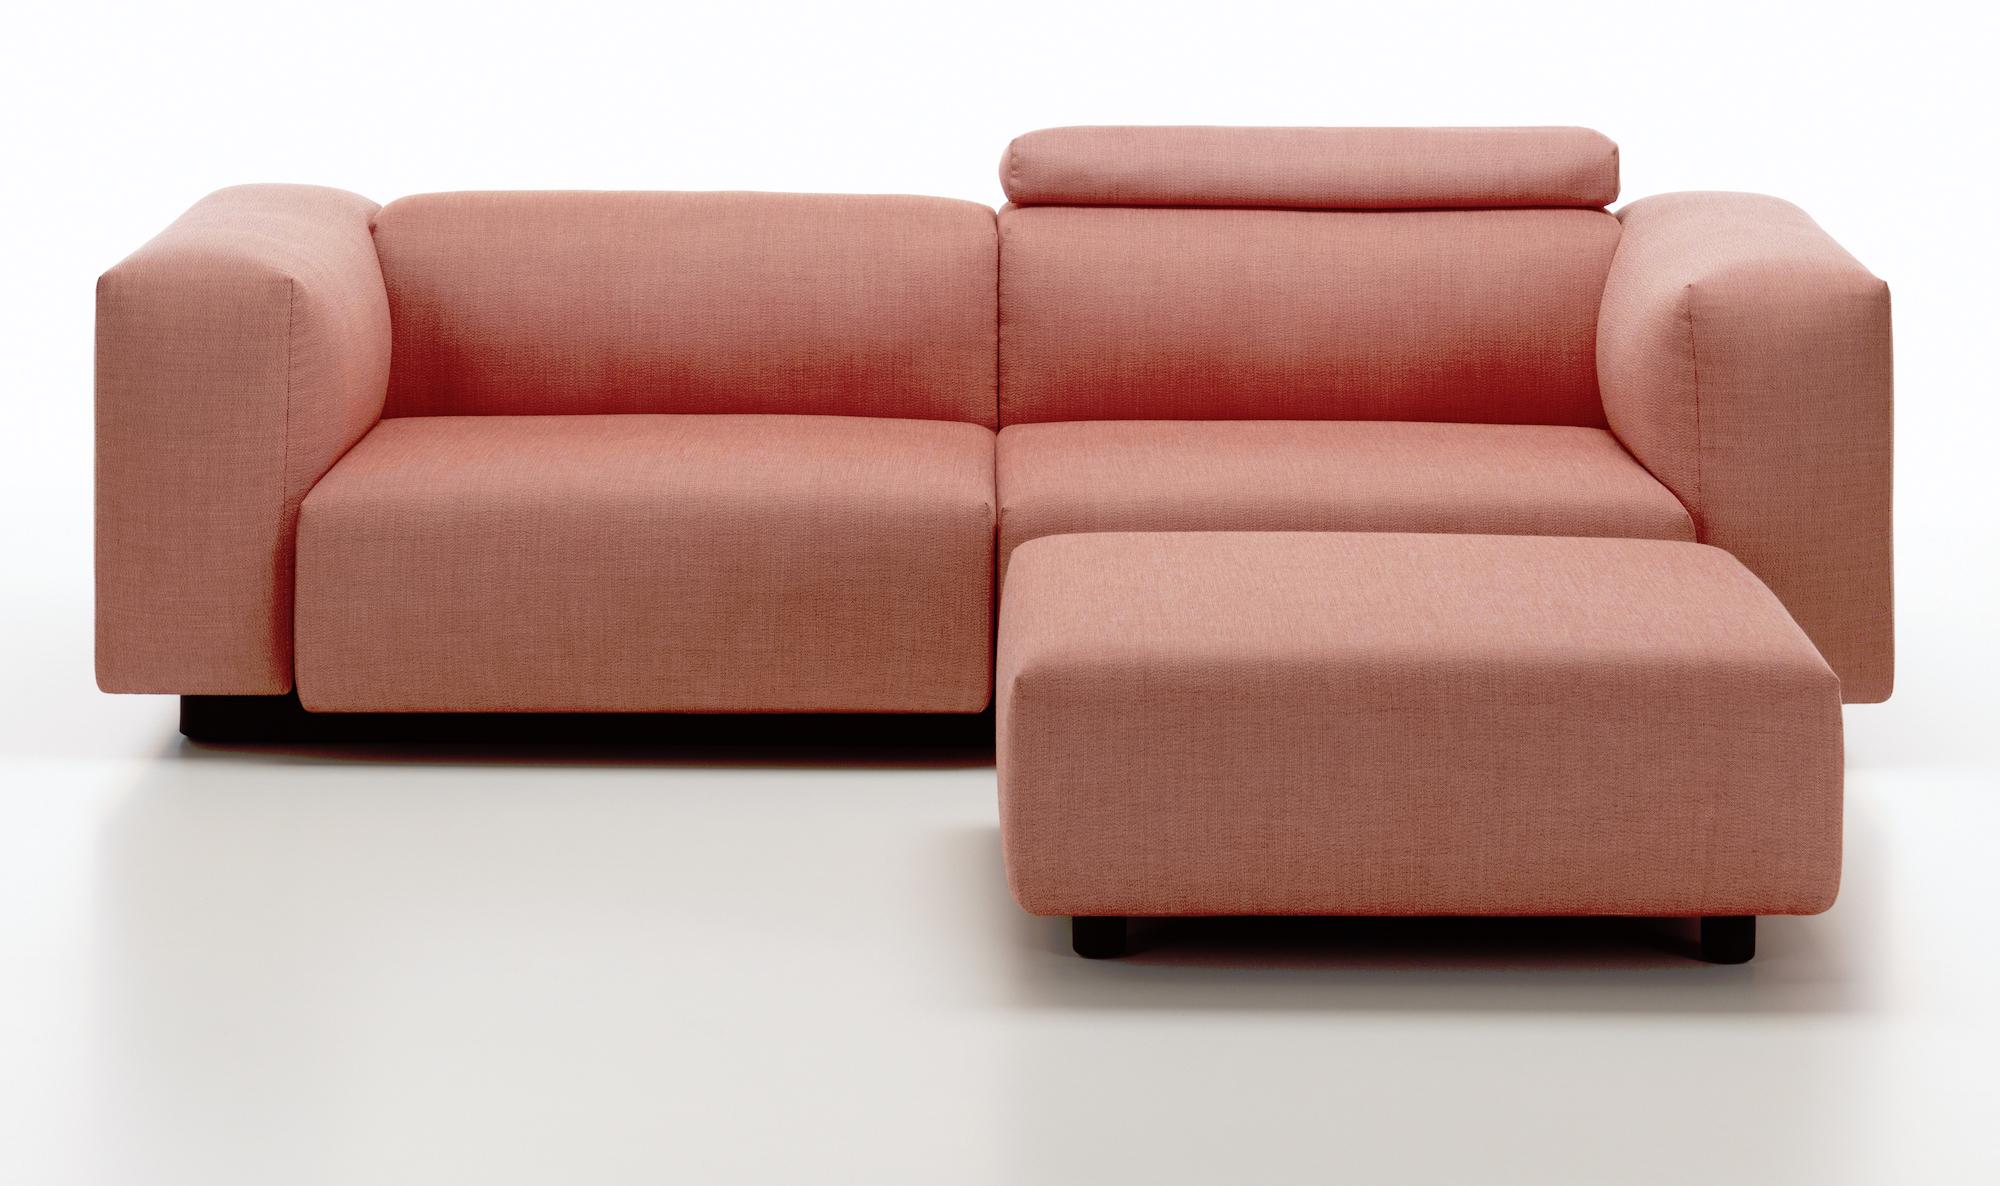 vitra  soft modular sofa  jasper morrison - compose your sofa